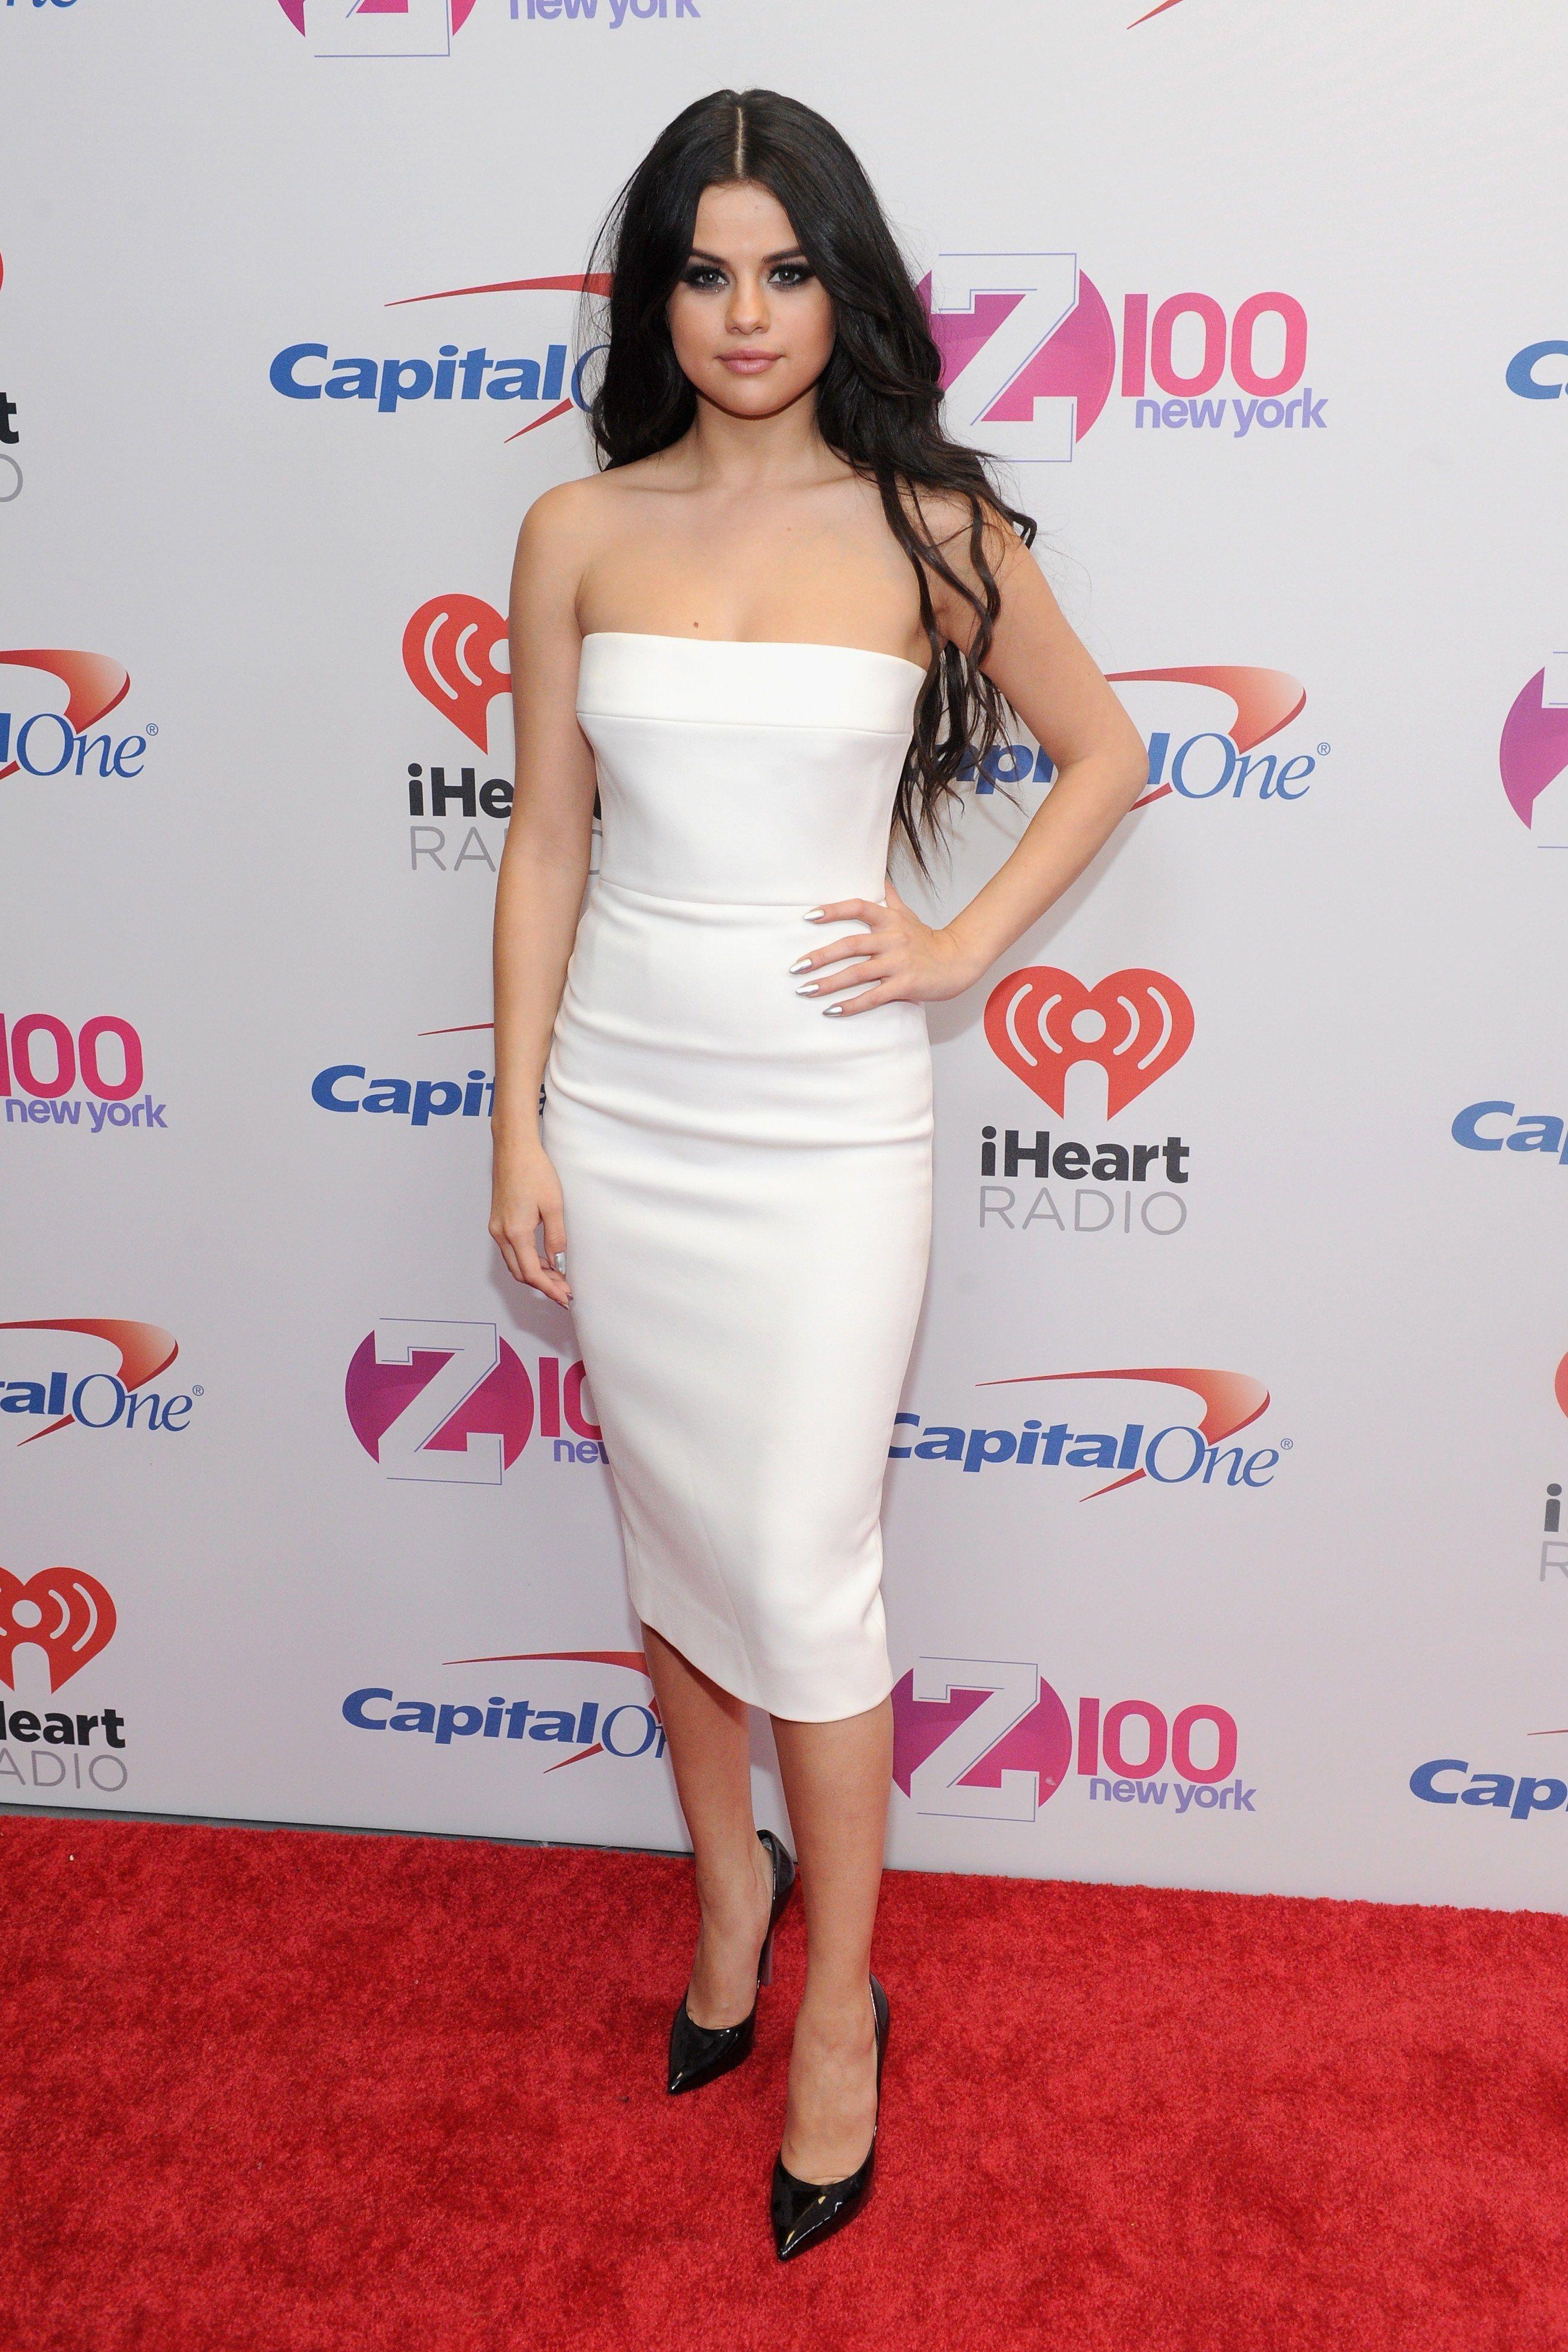 Selena Gomez Wore A Dress That Was Half Sweater Half Ballgown Selena Gomez Outfits Selena Gomez Dress Selena Gomez White Dress